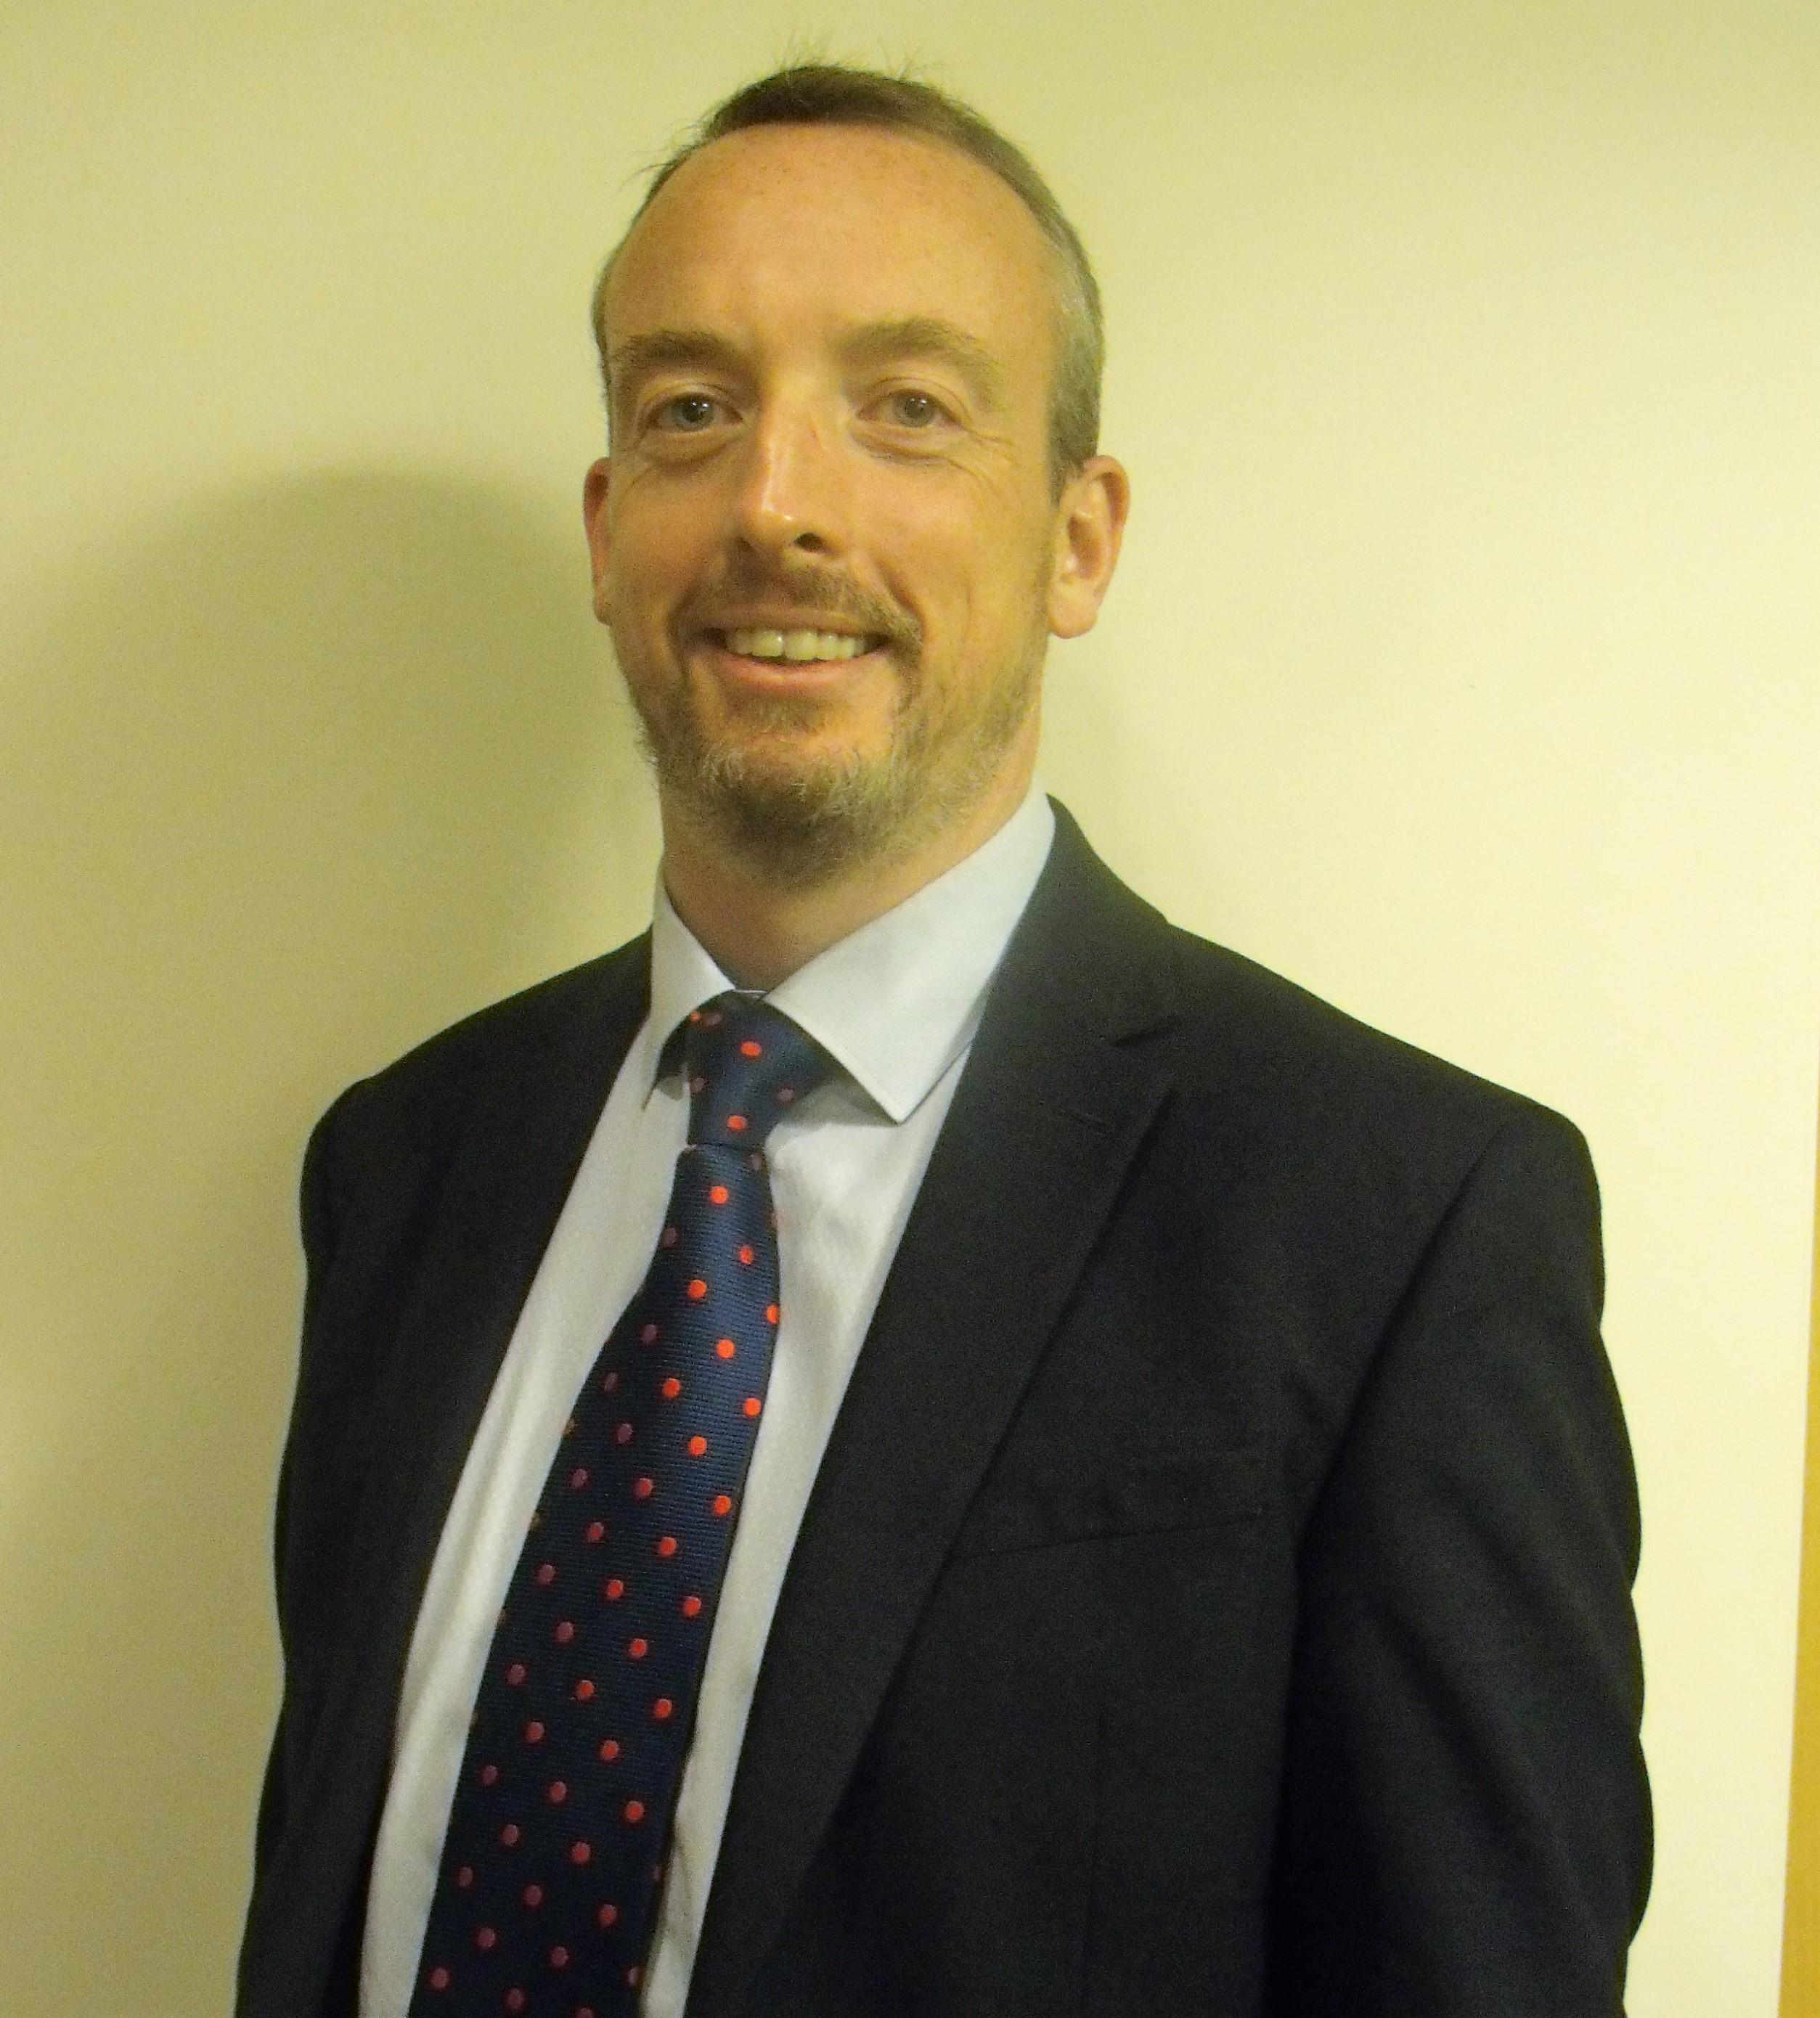 Mr Ian Hunter